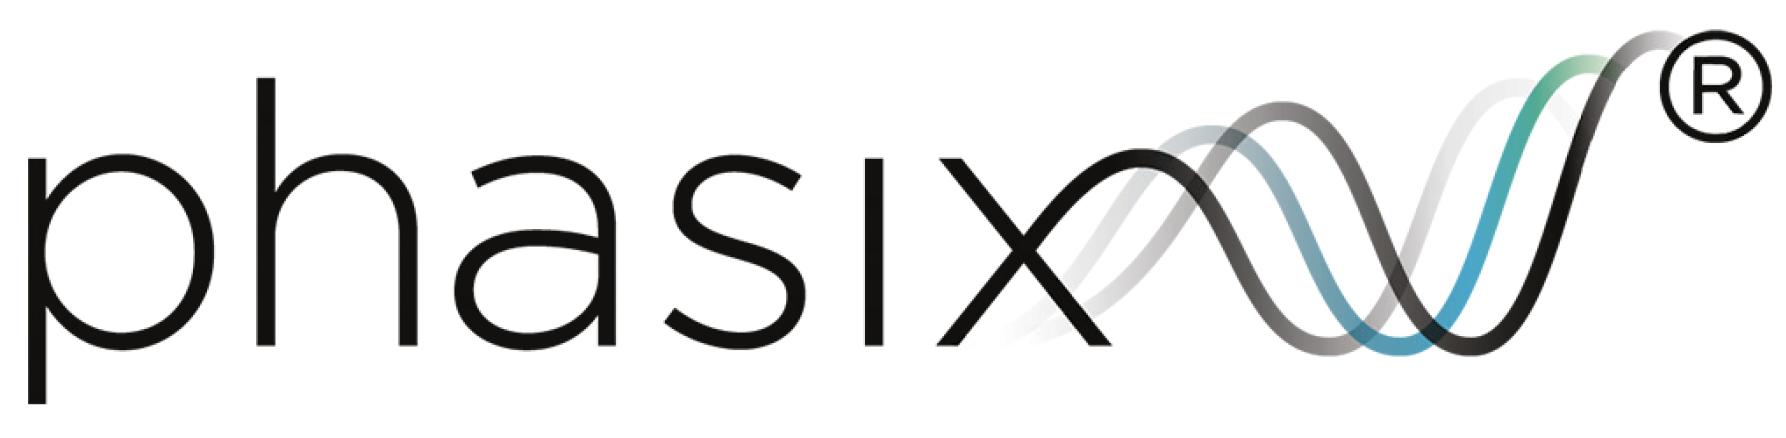 Loopings Innovation Systems Partner Phasix